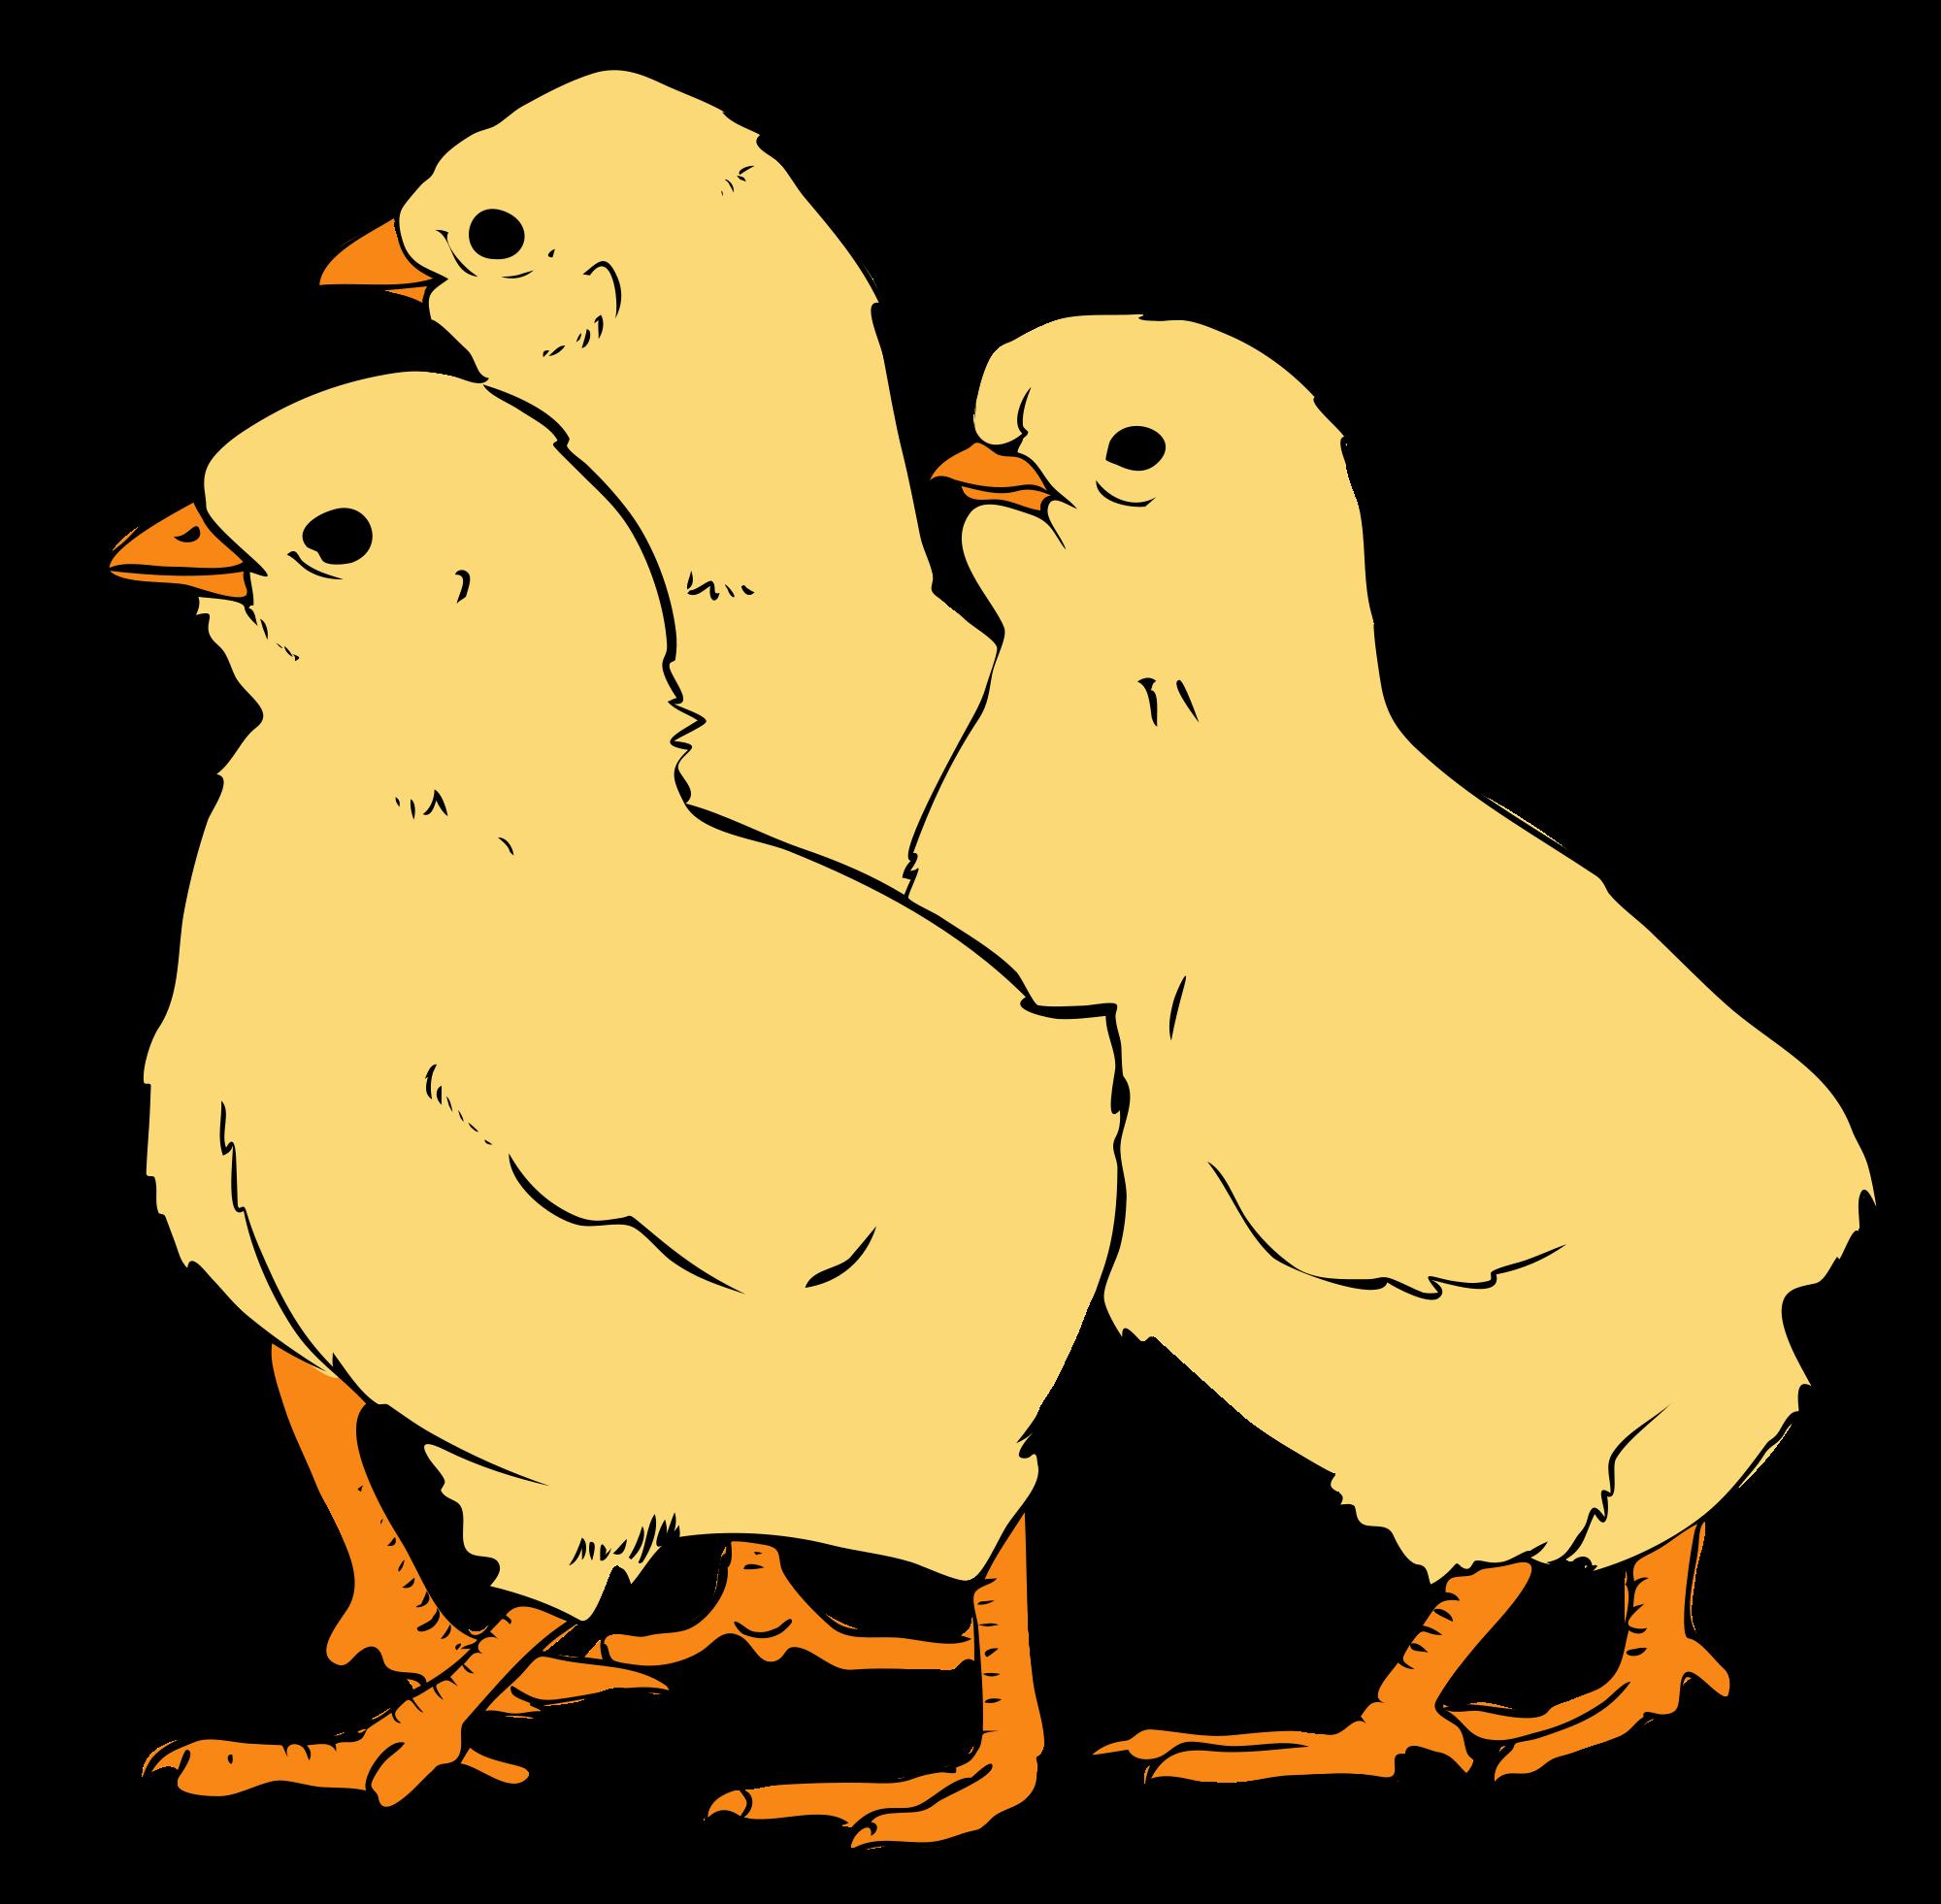 Chicks clipart #3